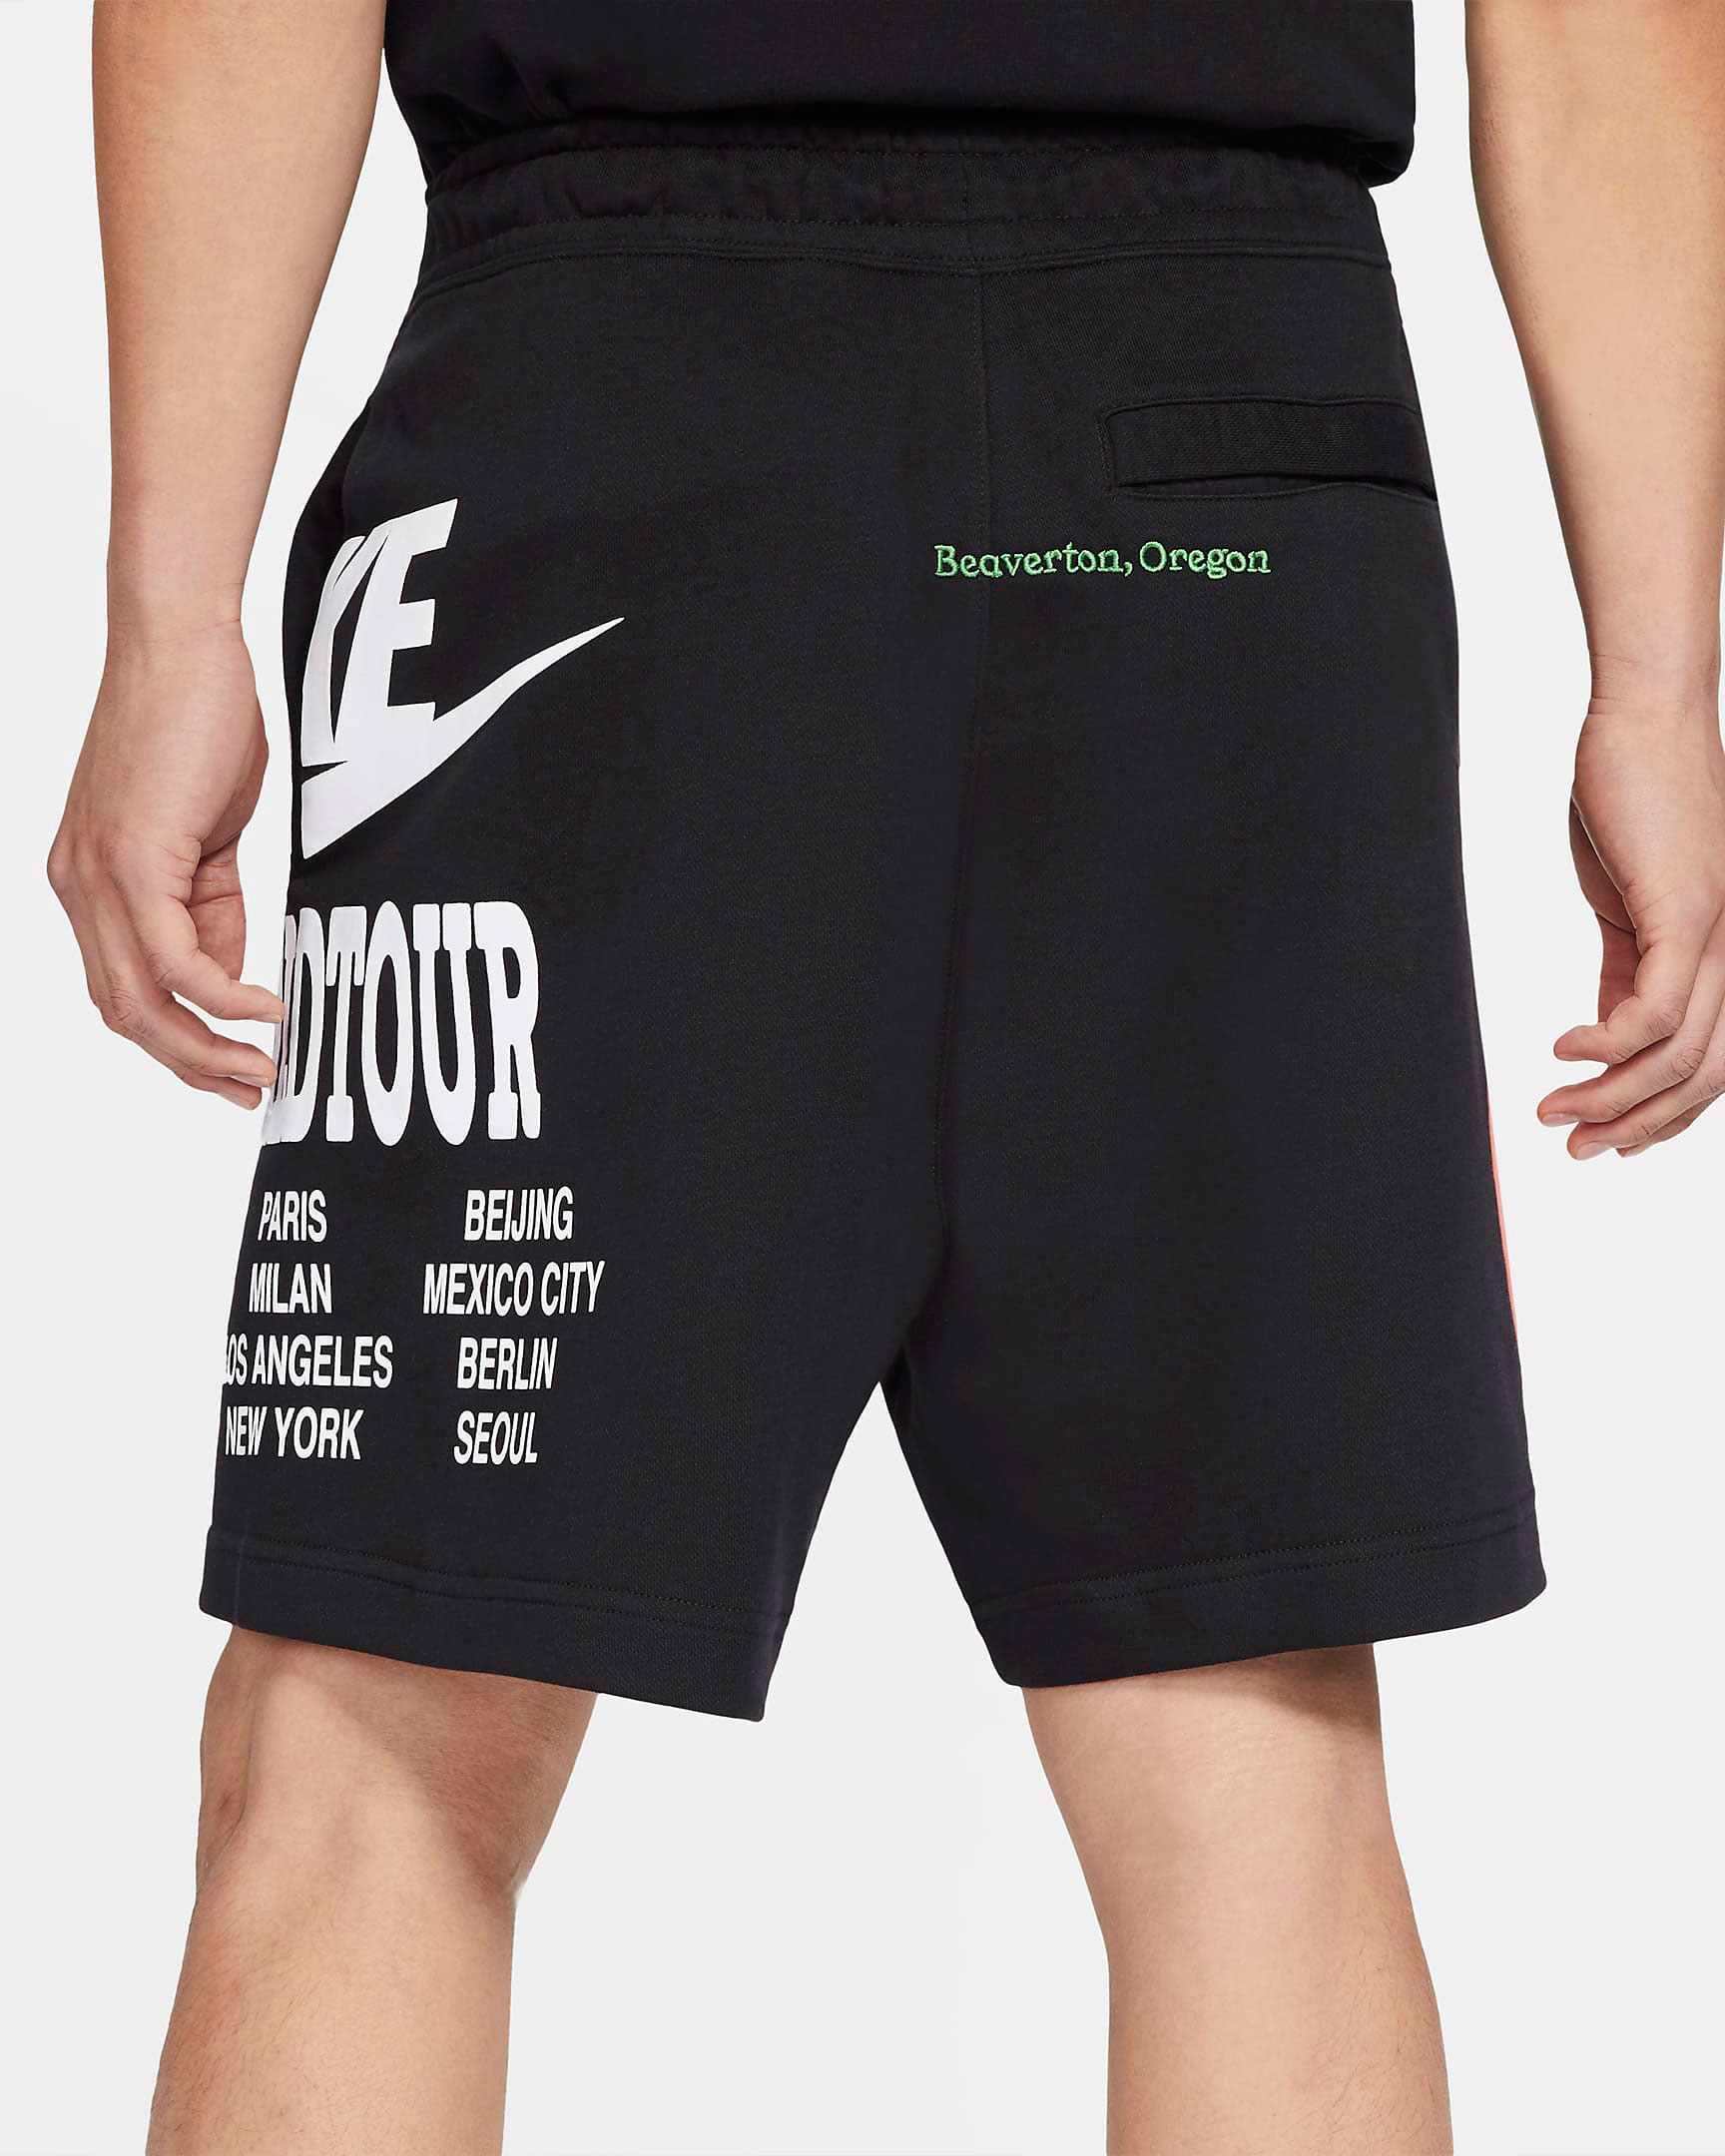 nike-world-tour-shorts-black-3